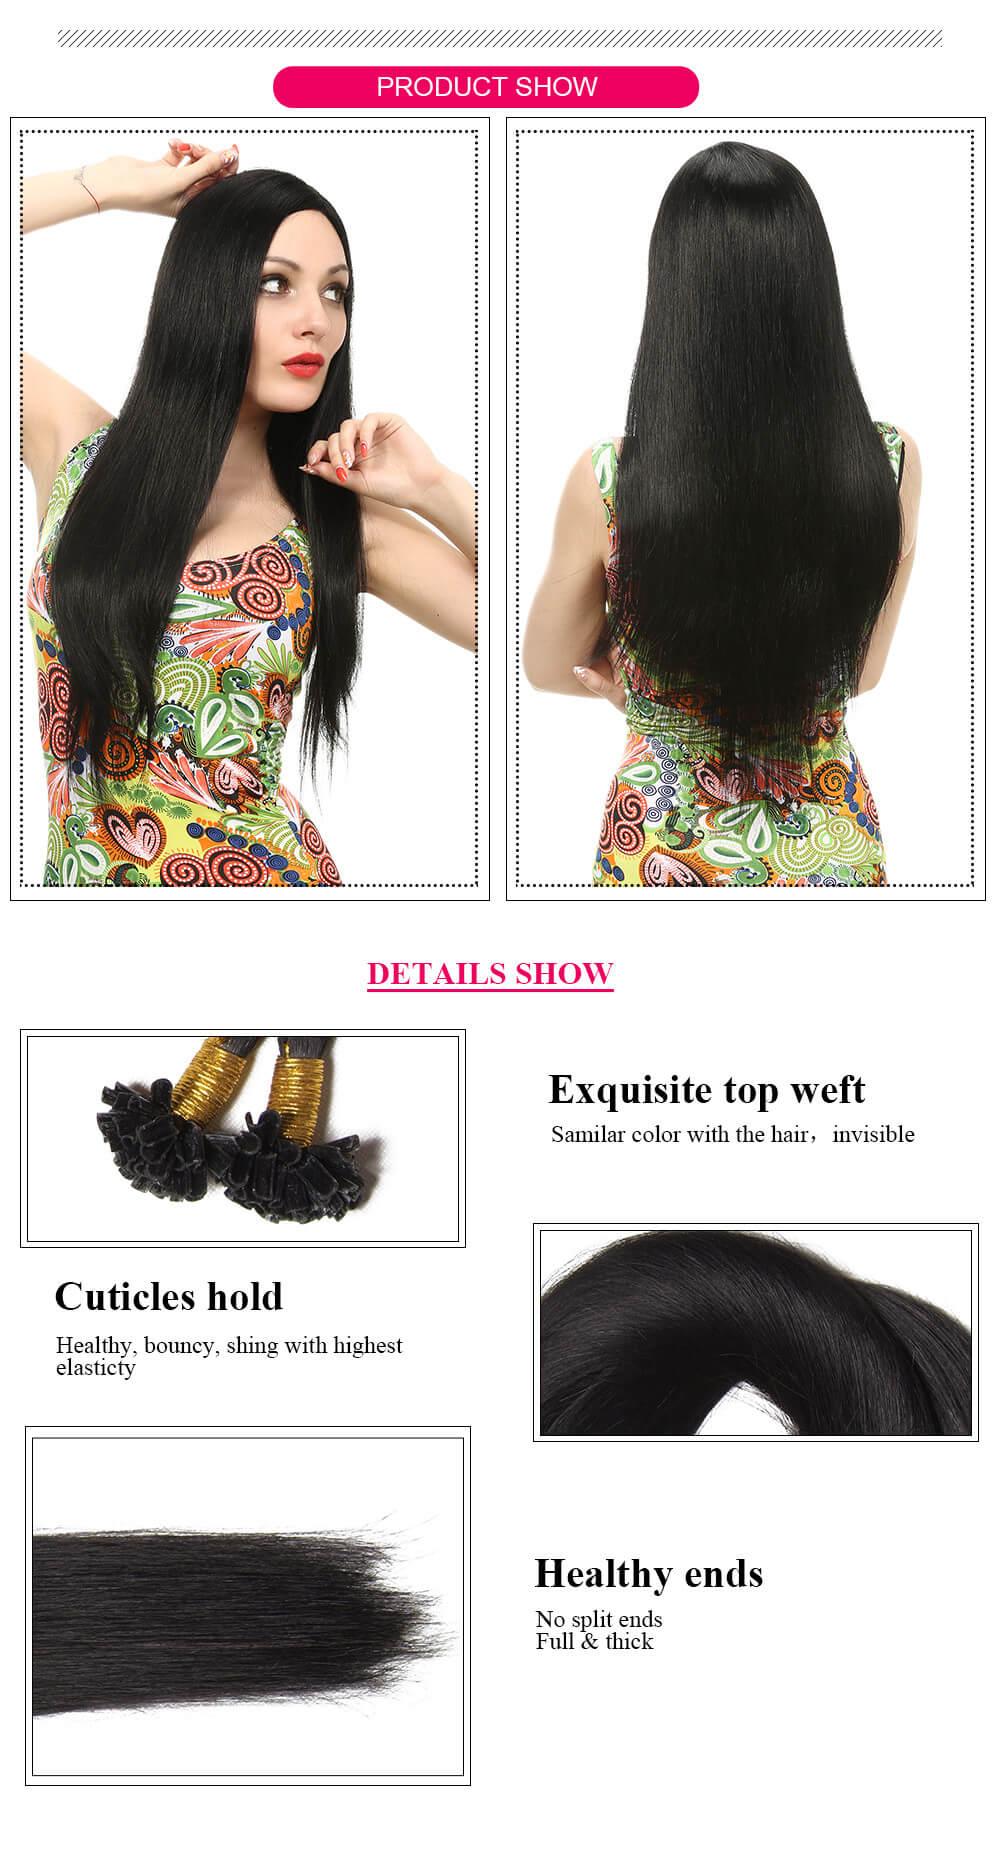 U Tip hair product details